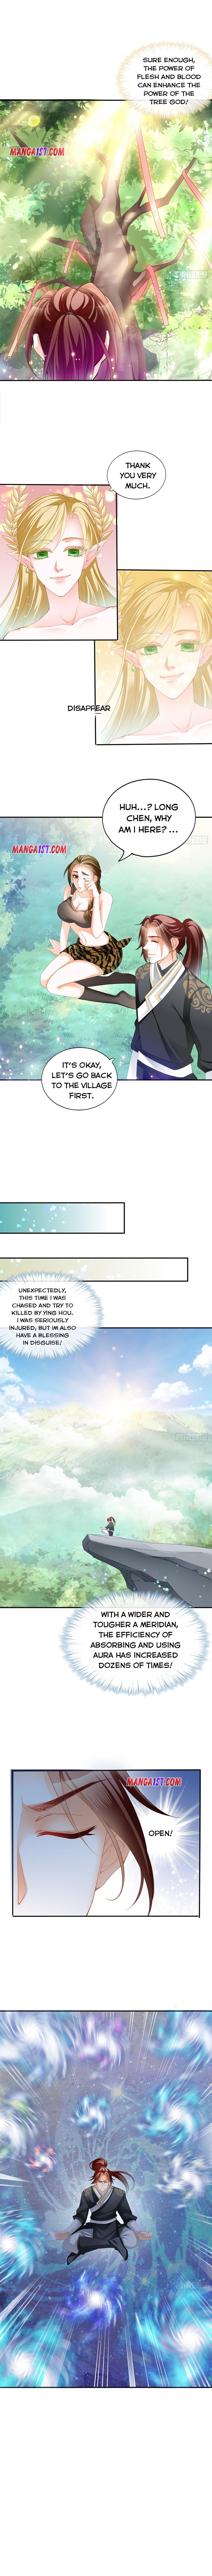 Secret Arts Of The Nine Star Tyrant Body Chapter 42 page 3 - Mangakakalots.com